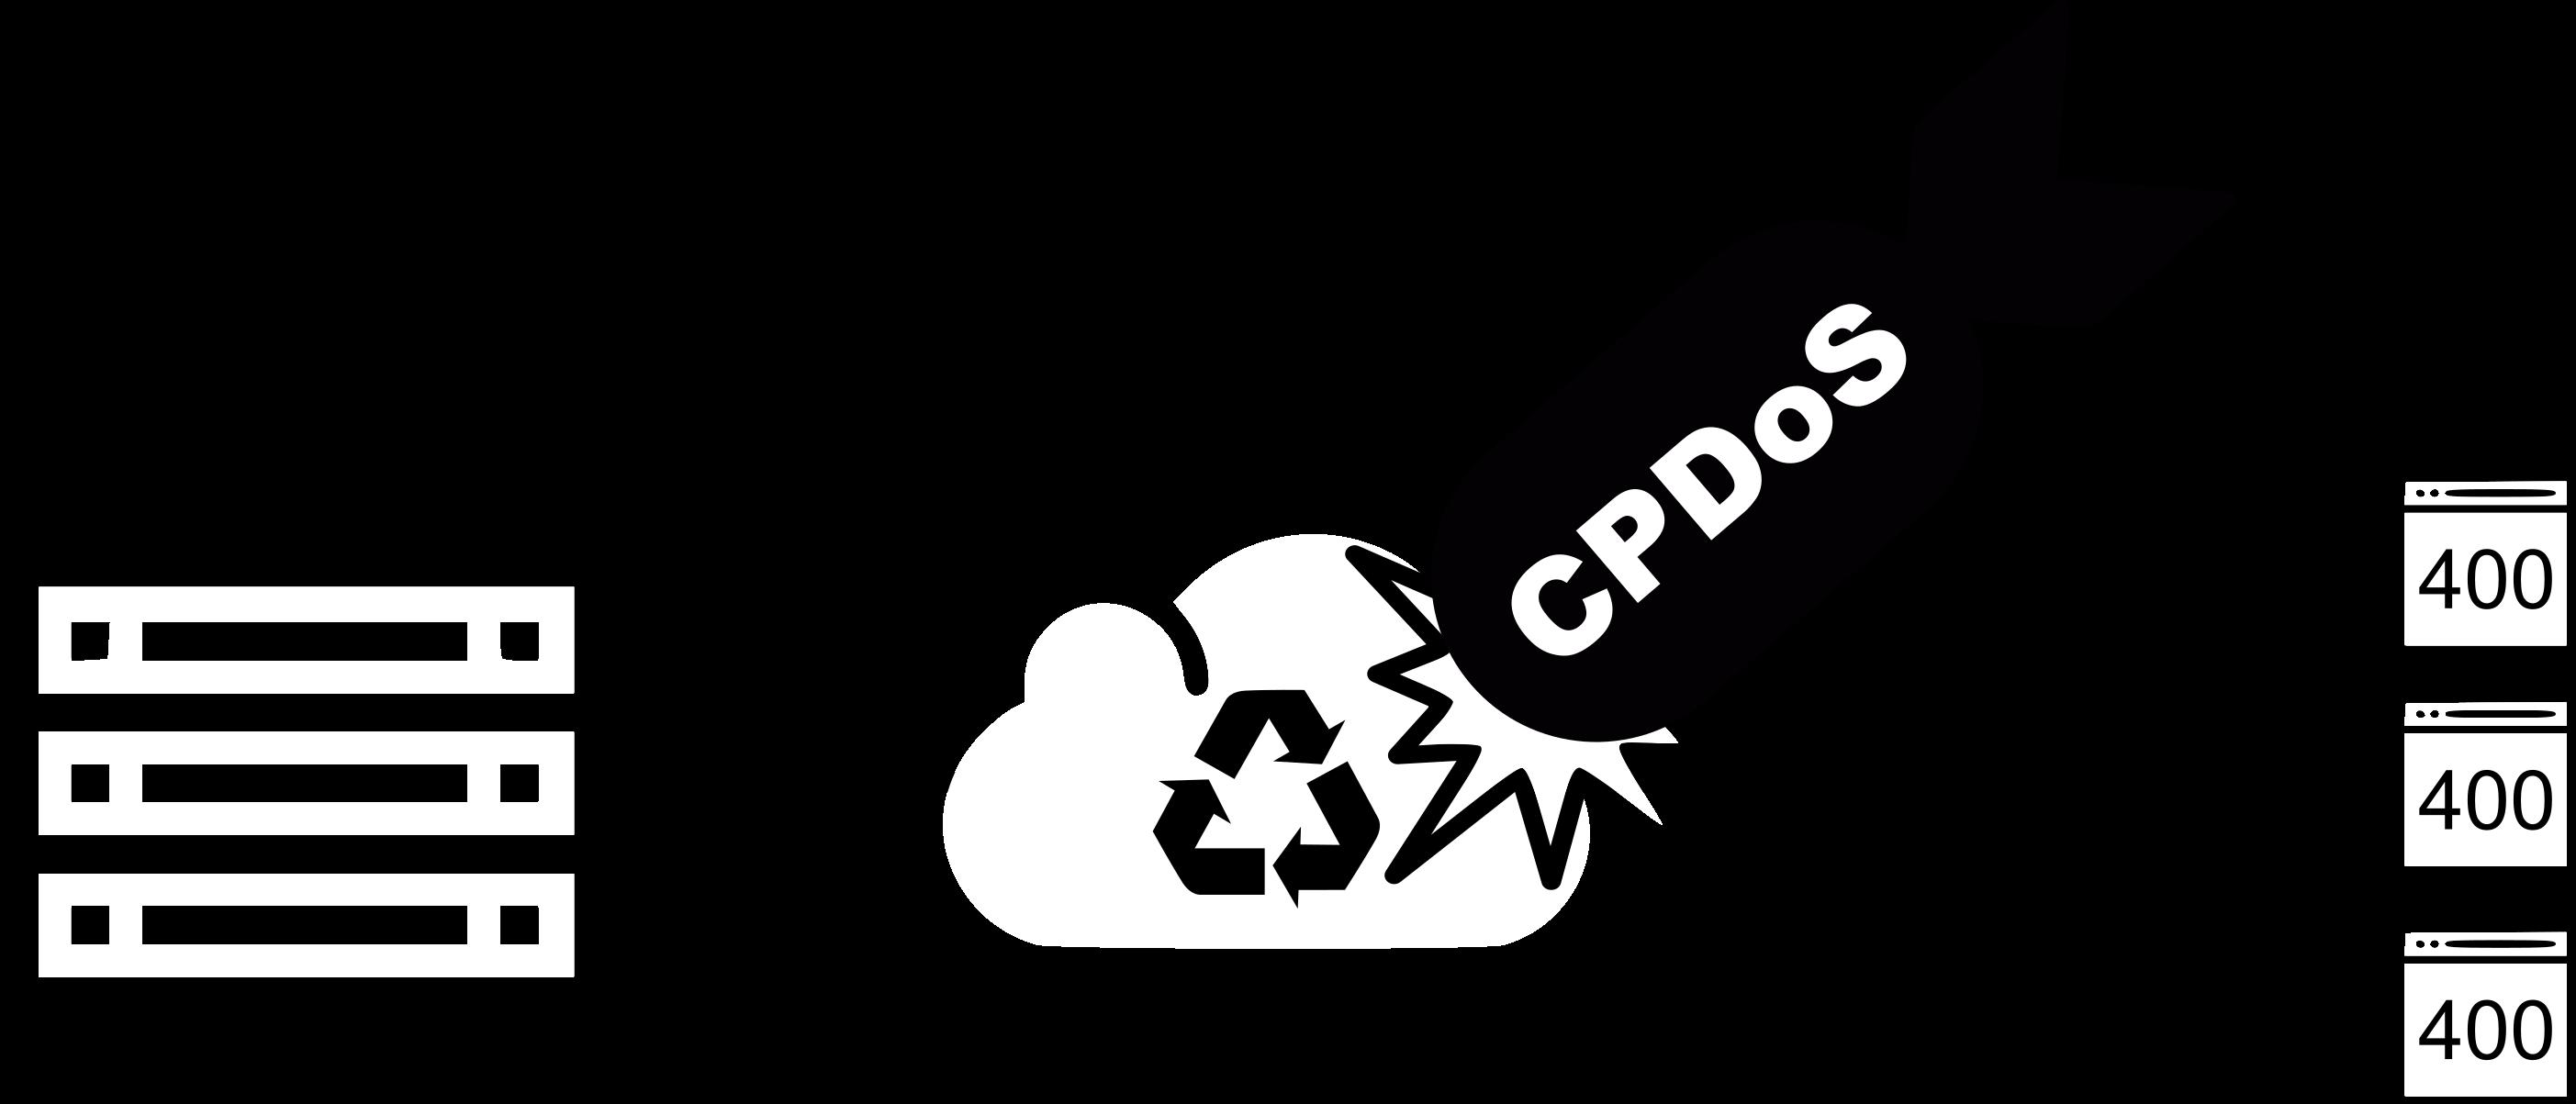 cpdos.org